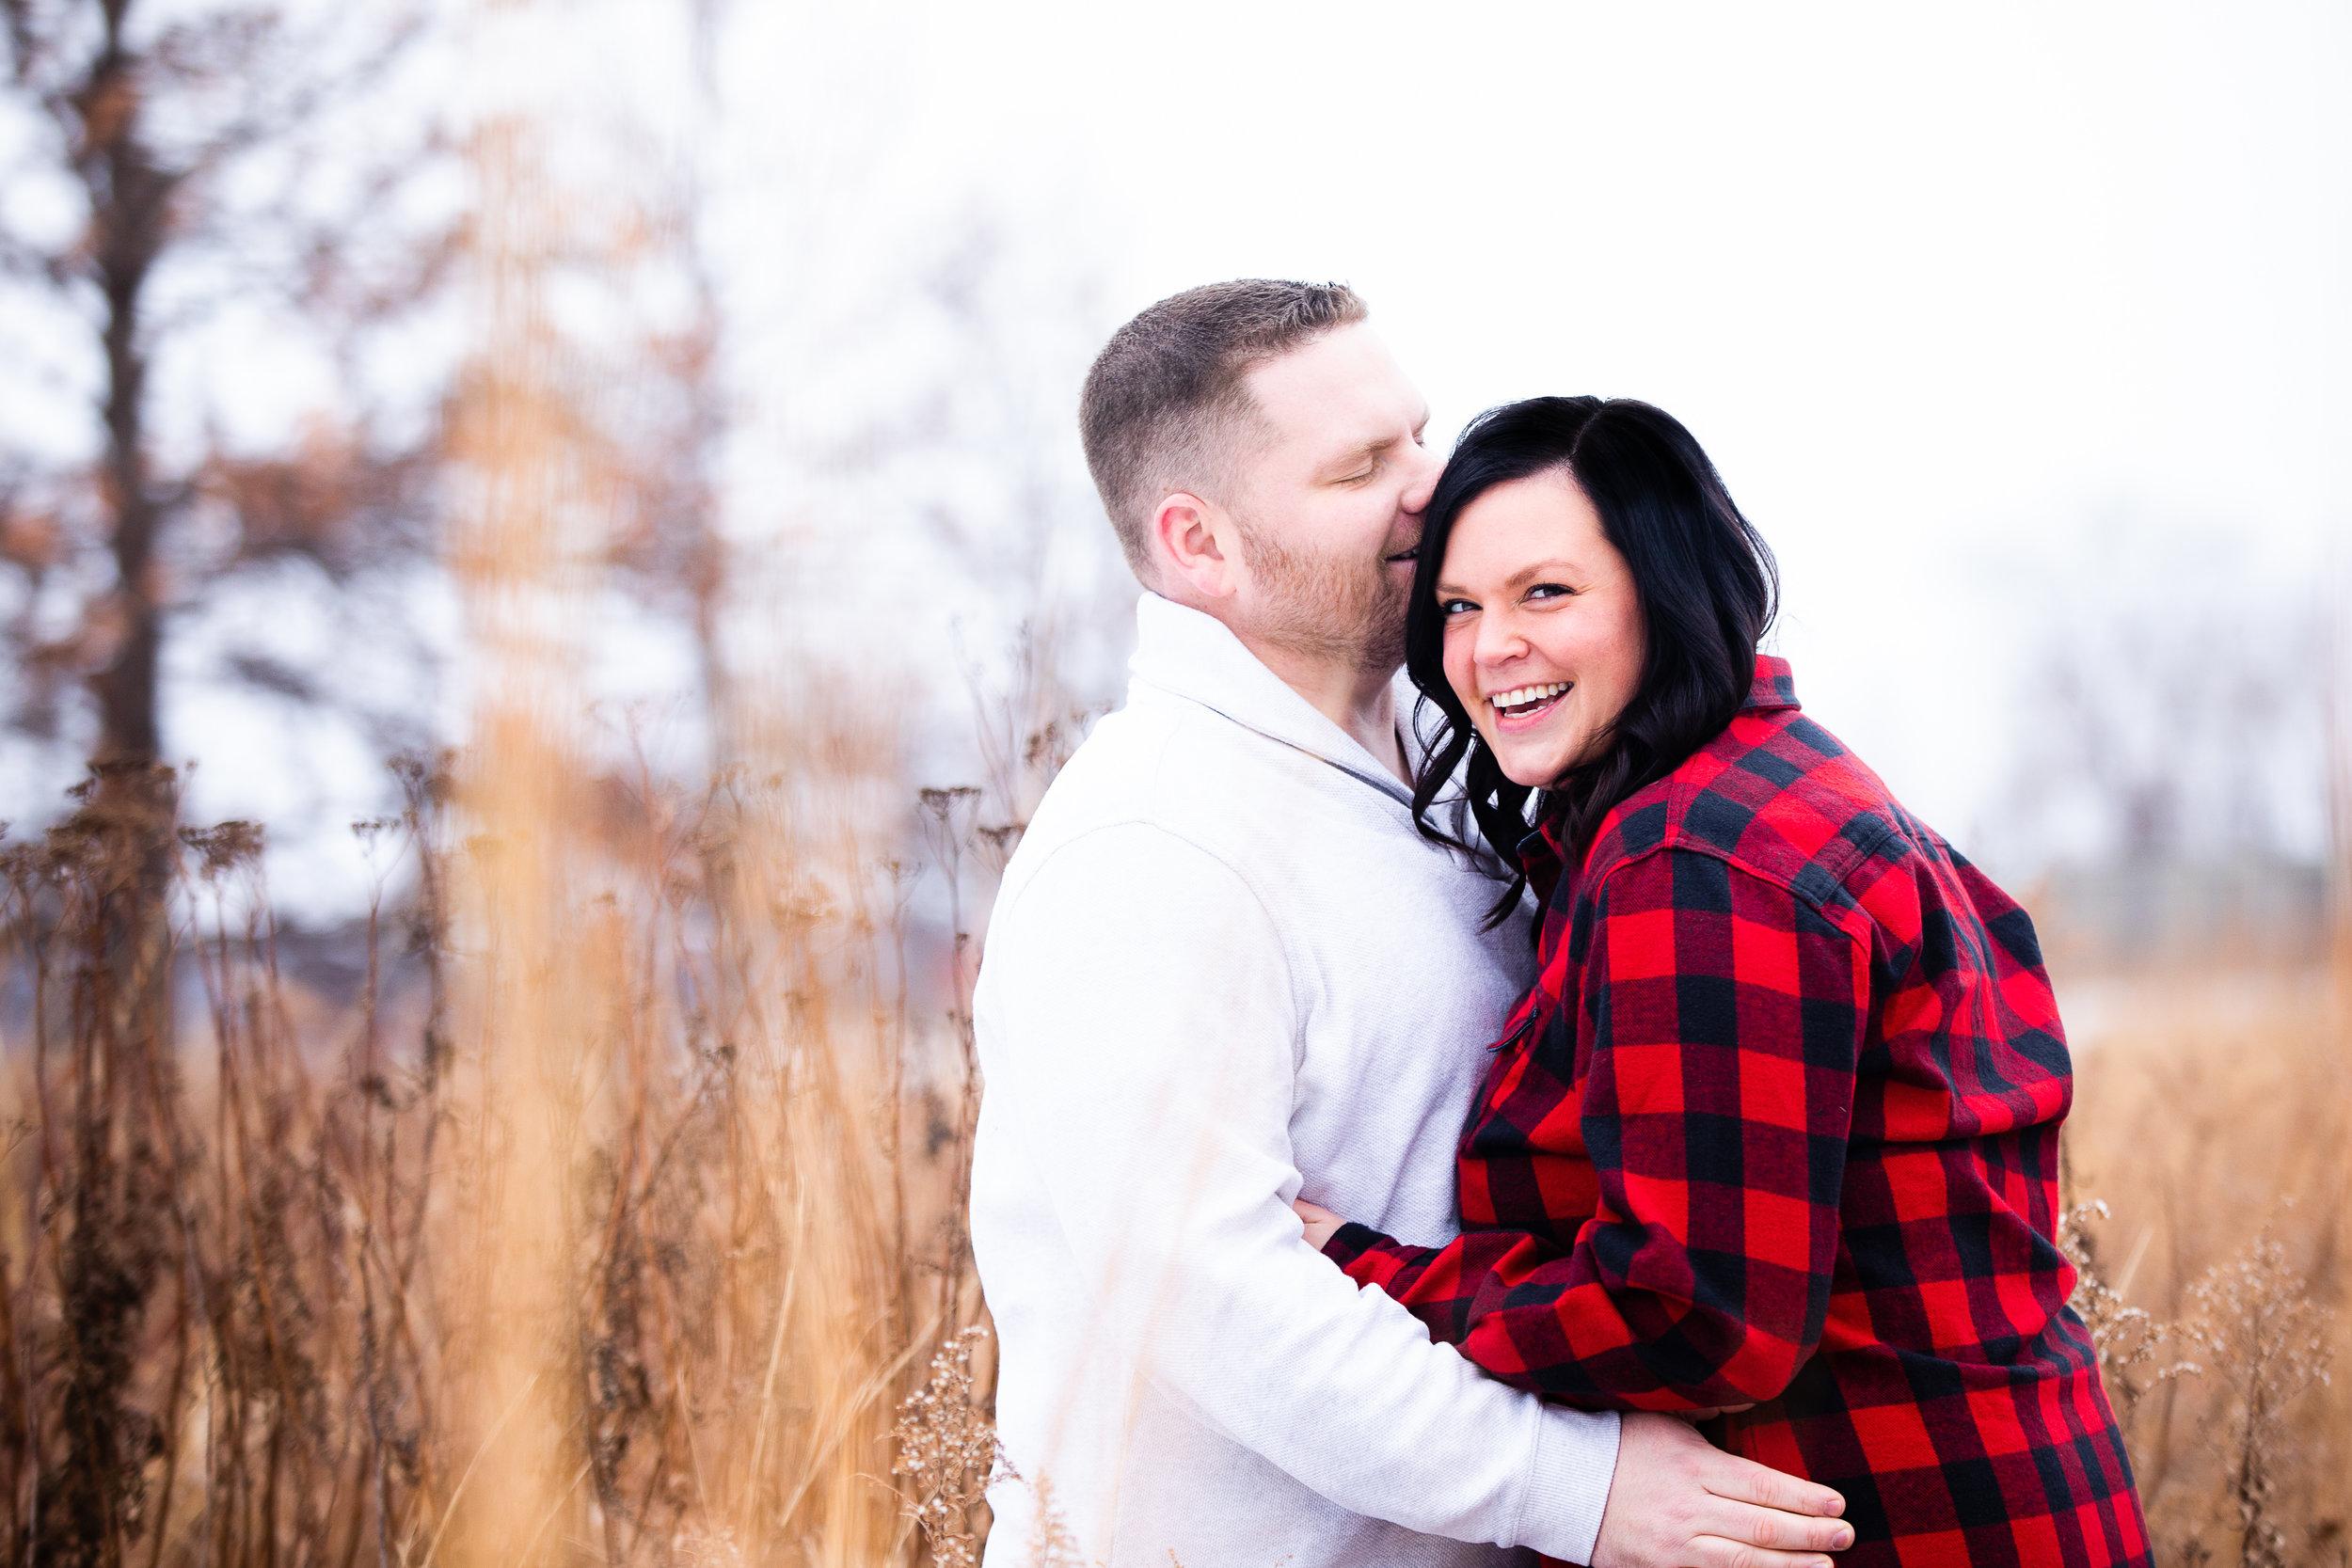 20181230_Kevin&Kristine_Engagement-129.jpg